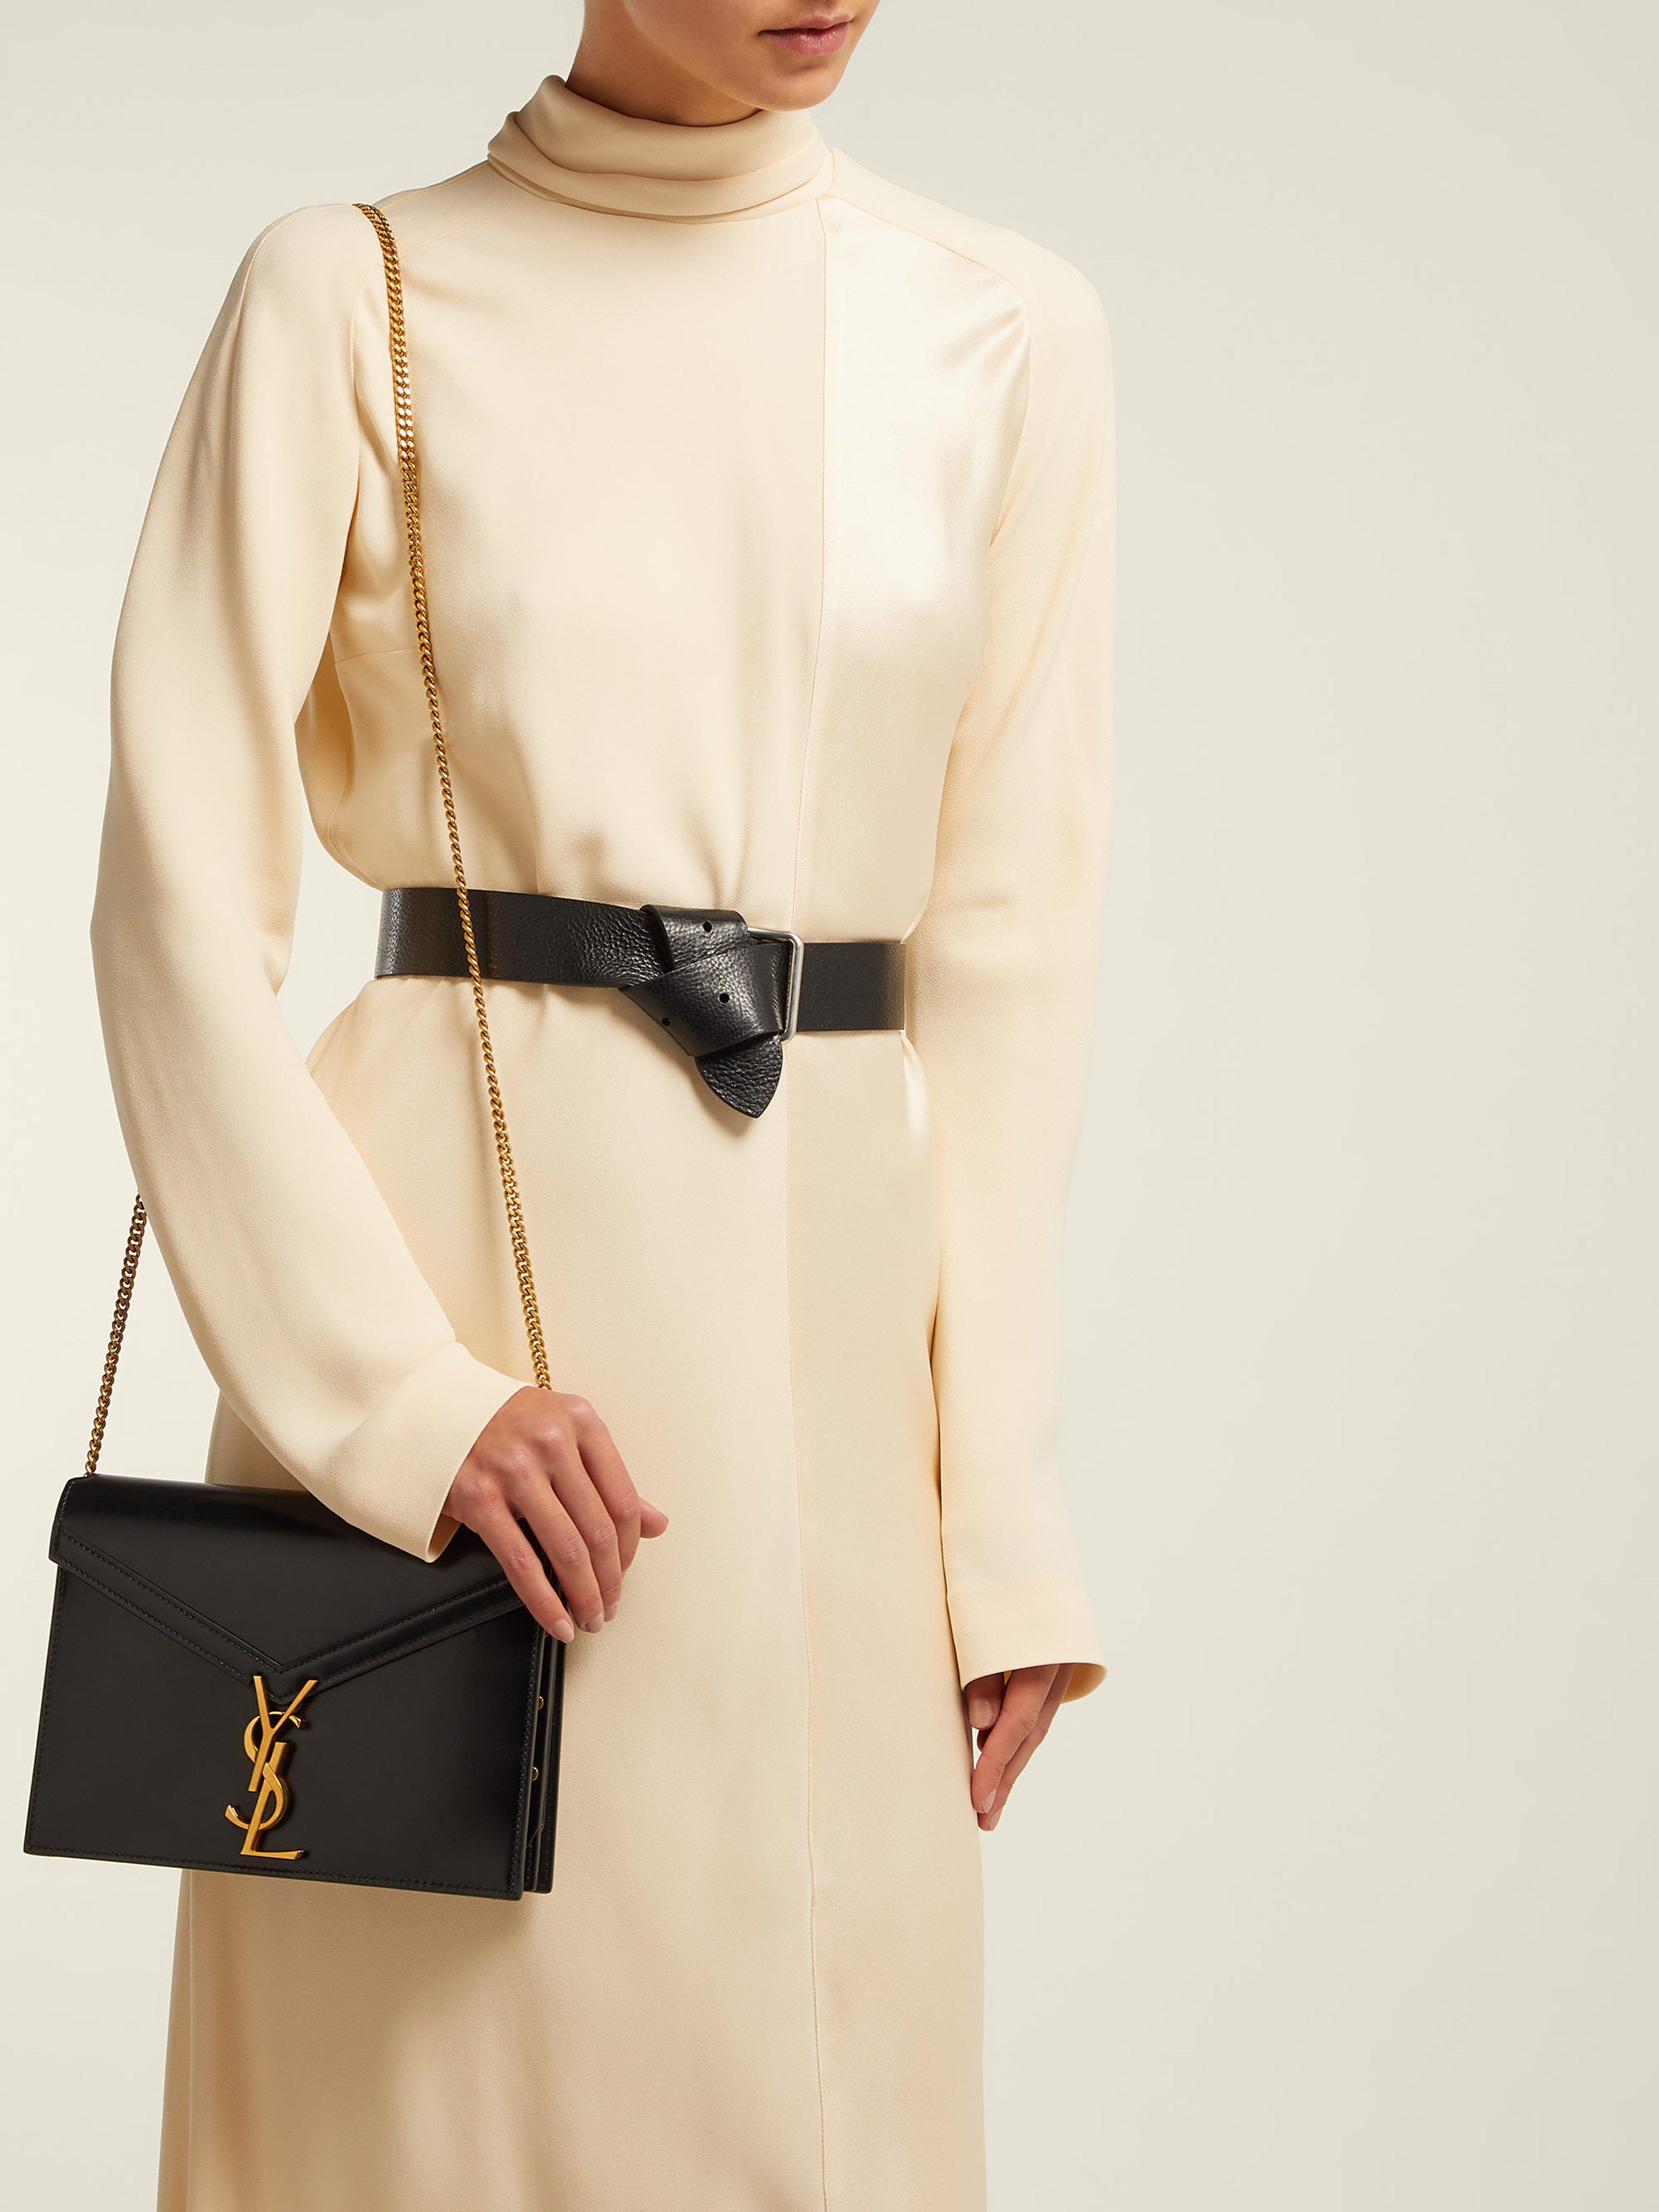 1580ad38c52bb Saint Laurent Cassandra Monogram Leather Cross Body Bag in Black - Lyst